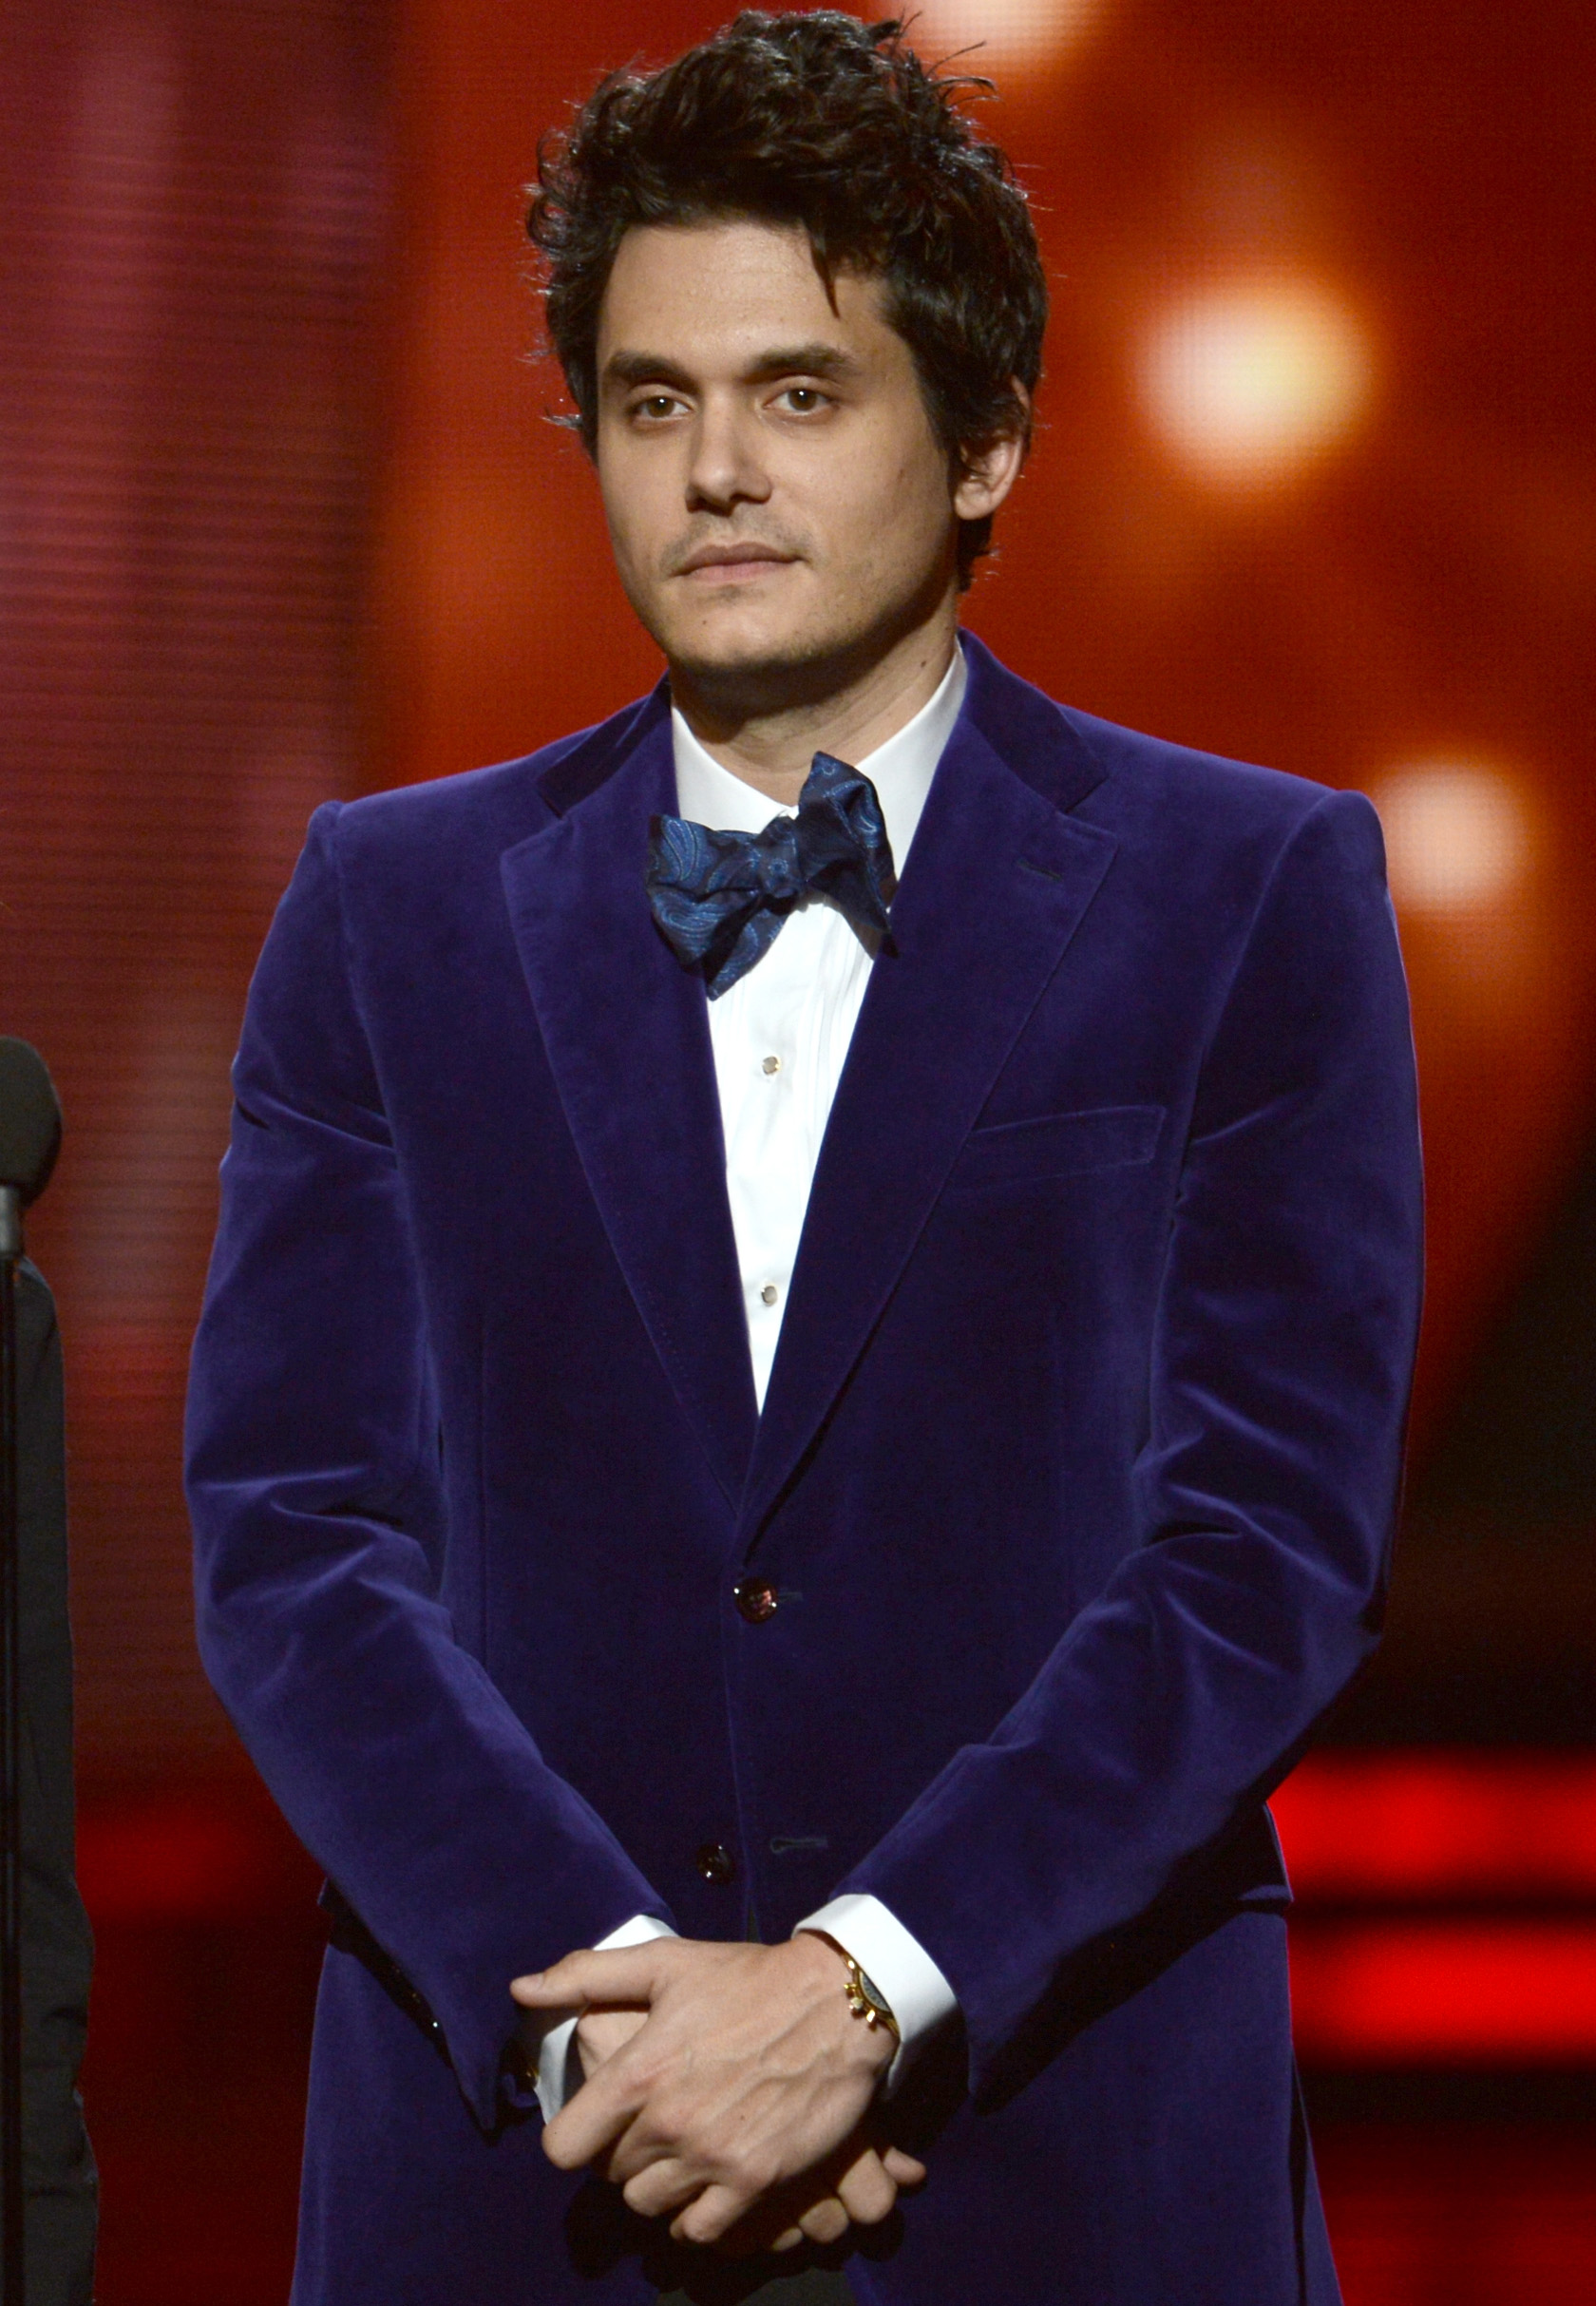 John Mayer wore a blue blazer at the Grammys.